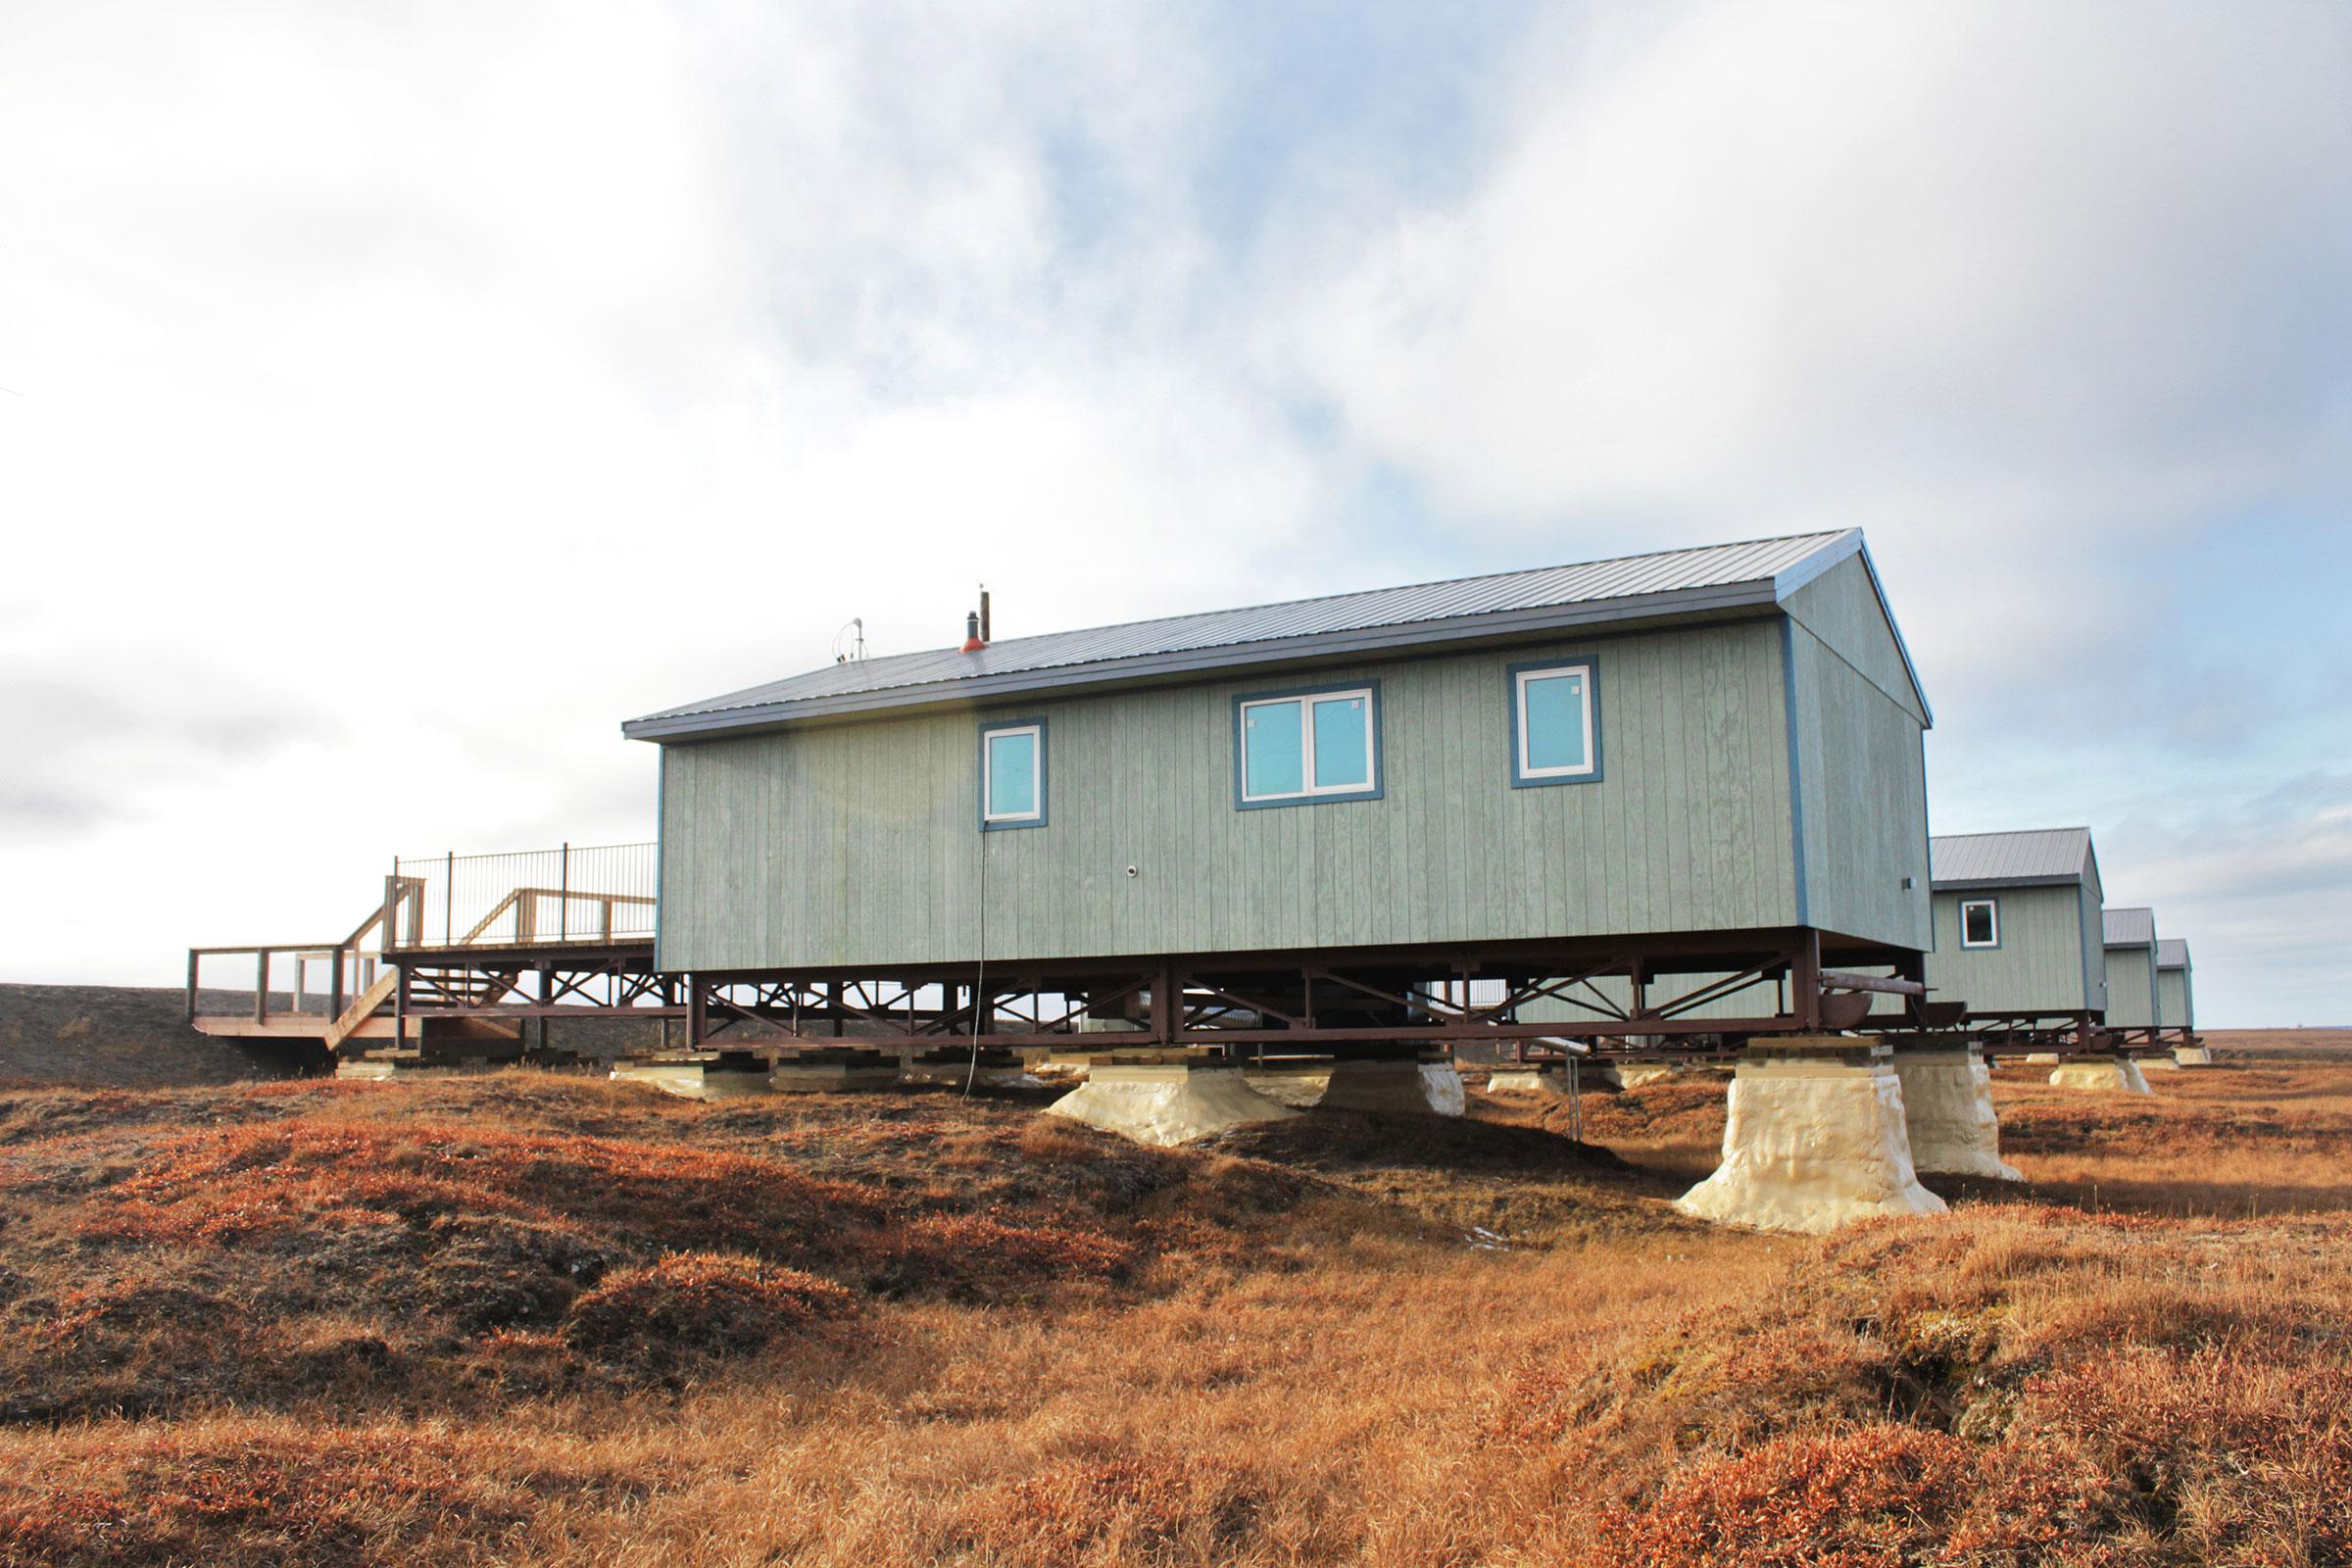 New, energy-efficient houses on the edge of Wainwright. Madeline Ostrander